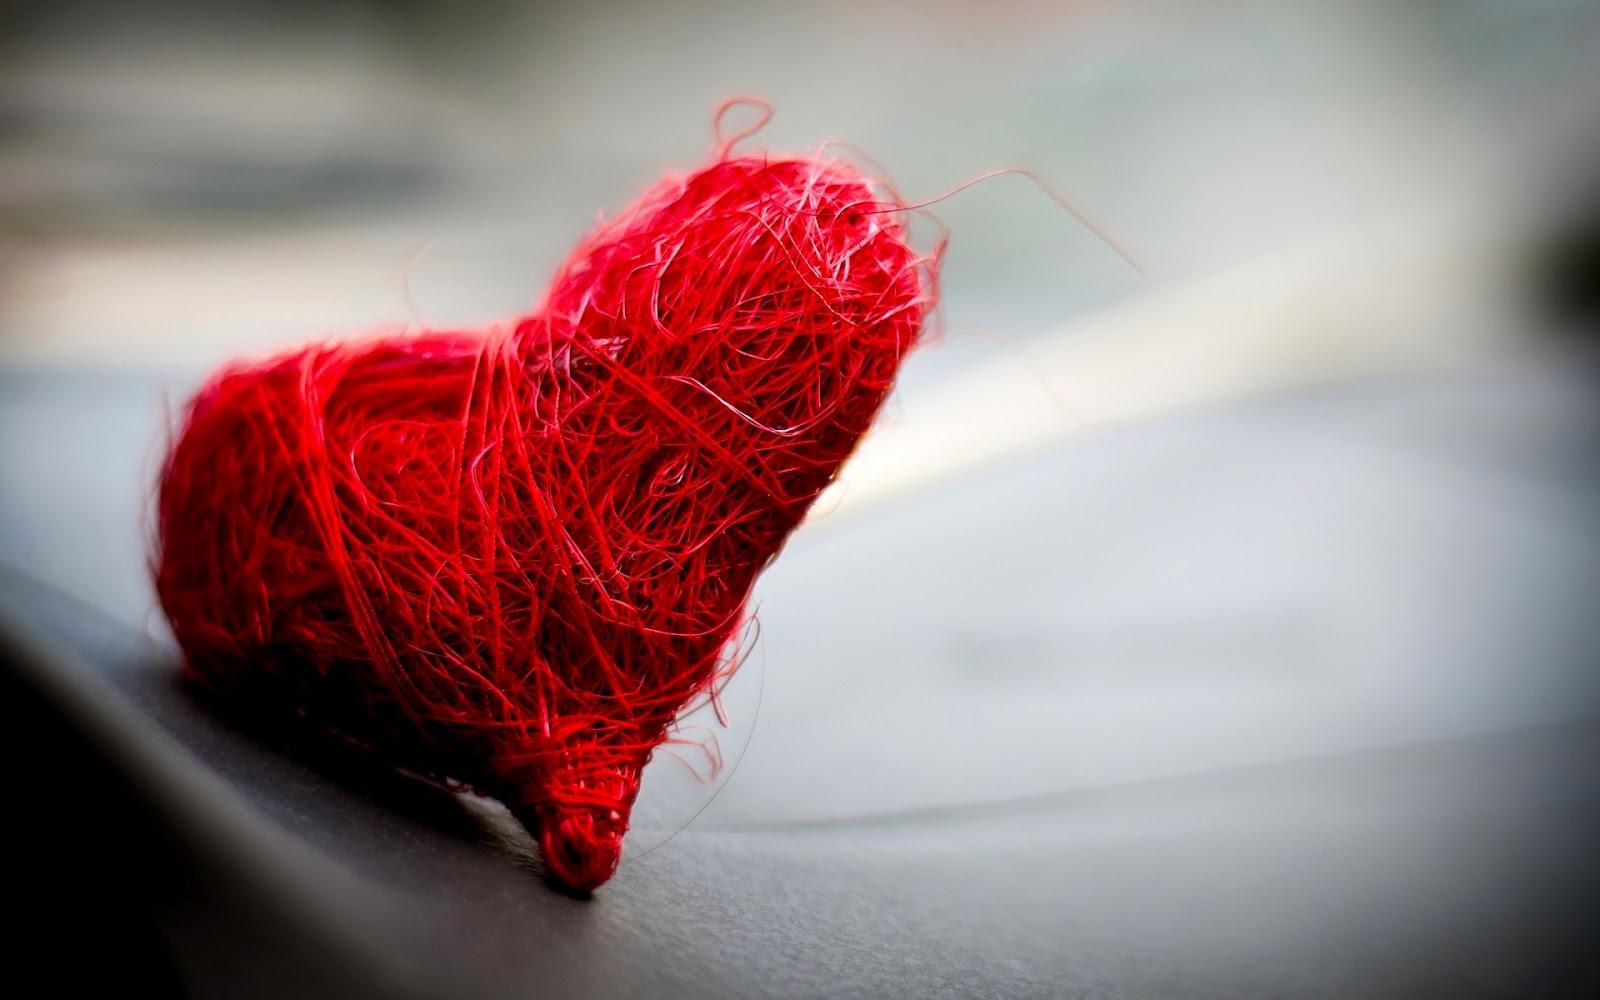 3d Broken Hearts Wallpaper Top 29 Beautiful Love Heart Wallpapers In Hd For More